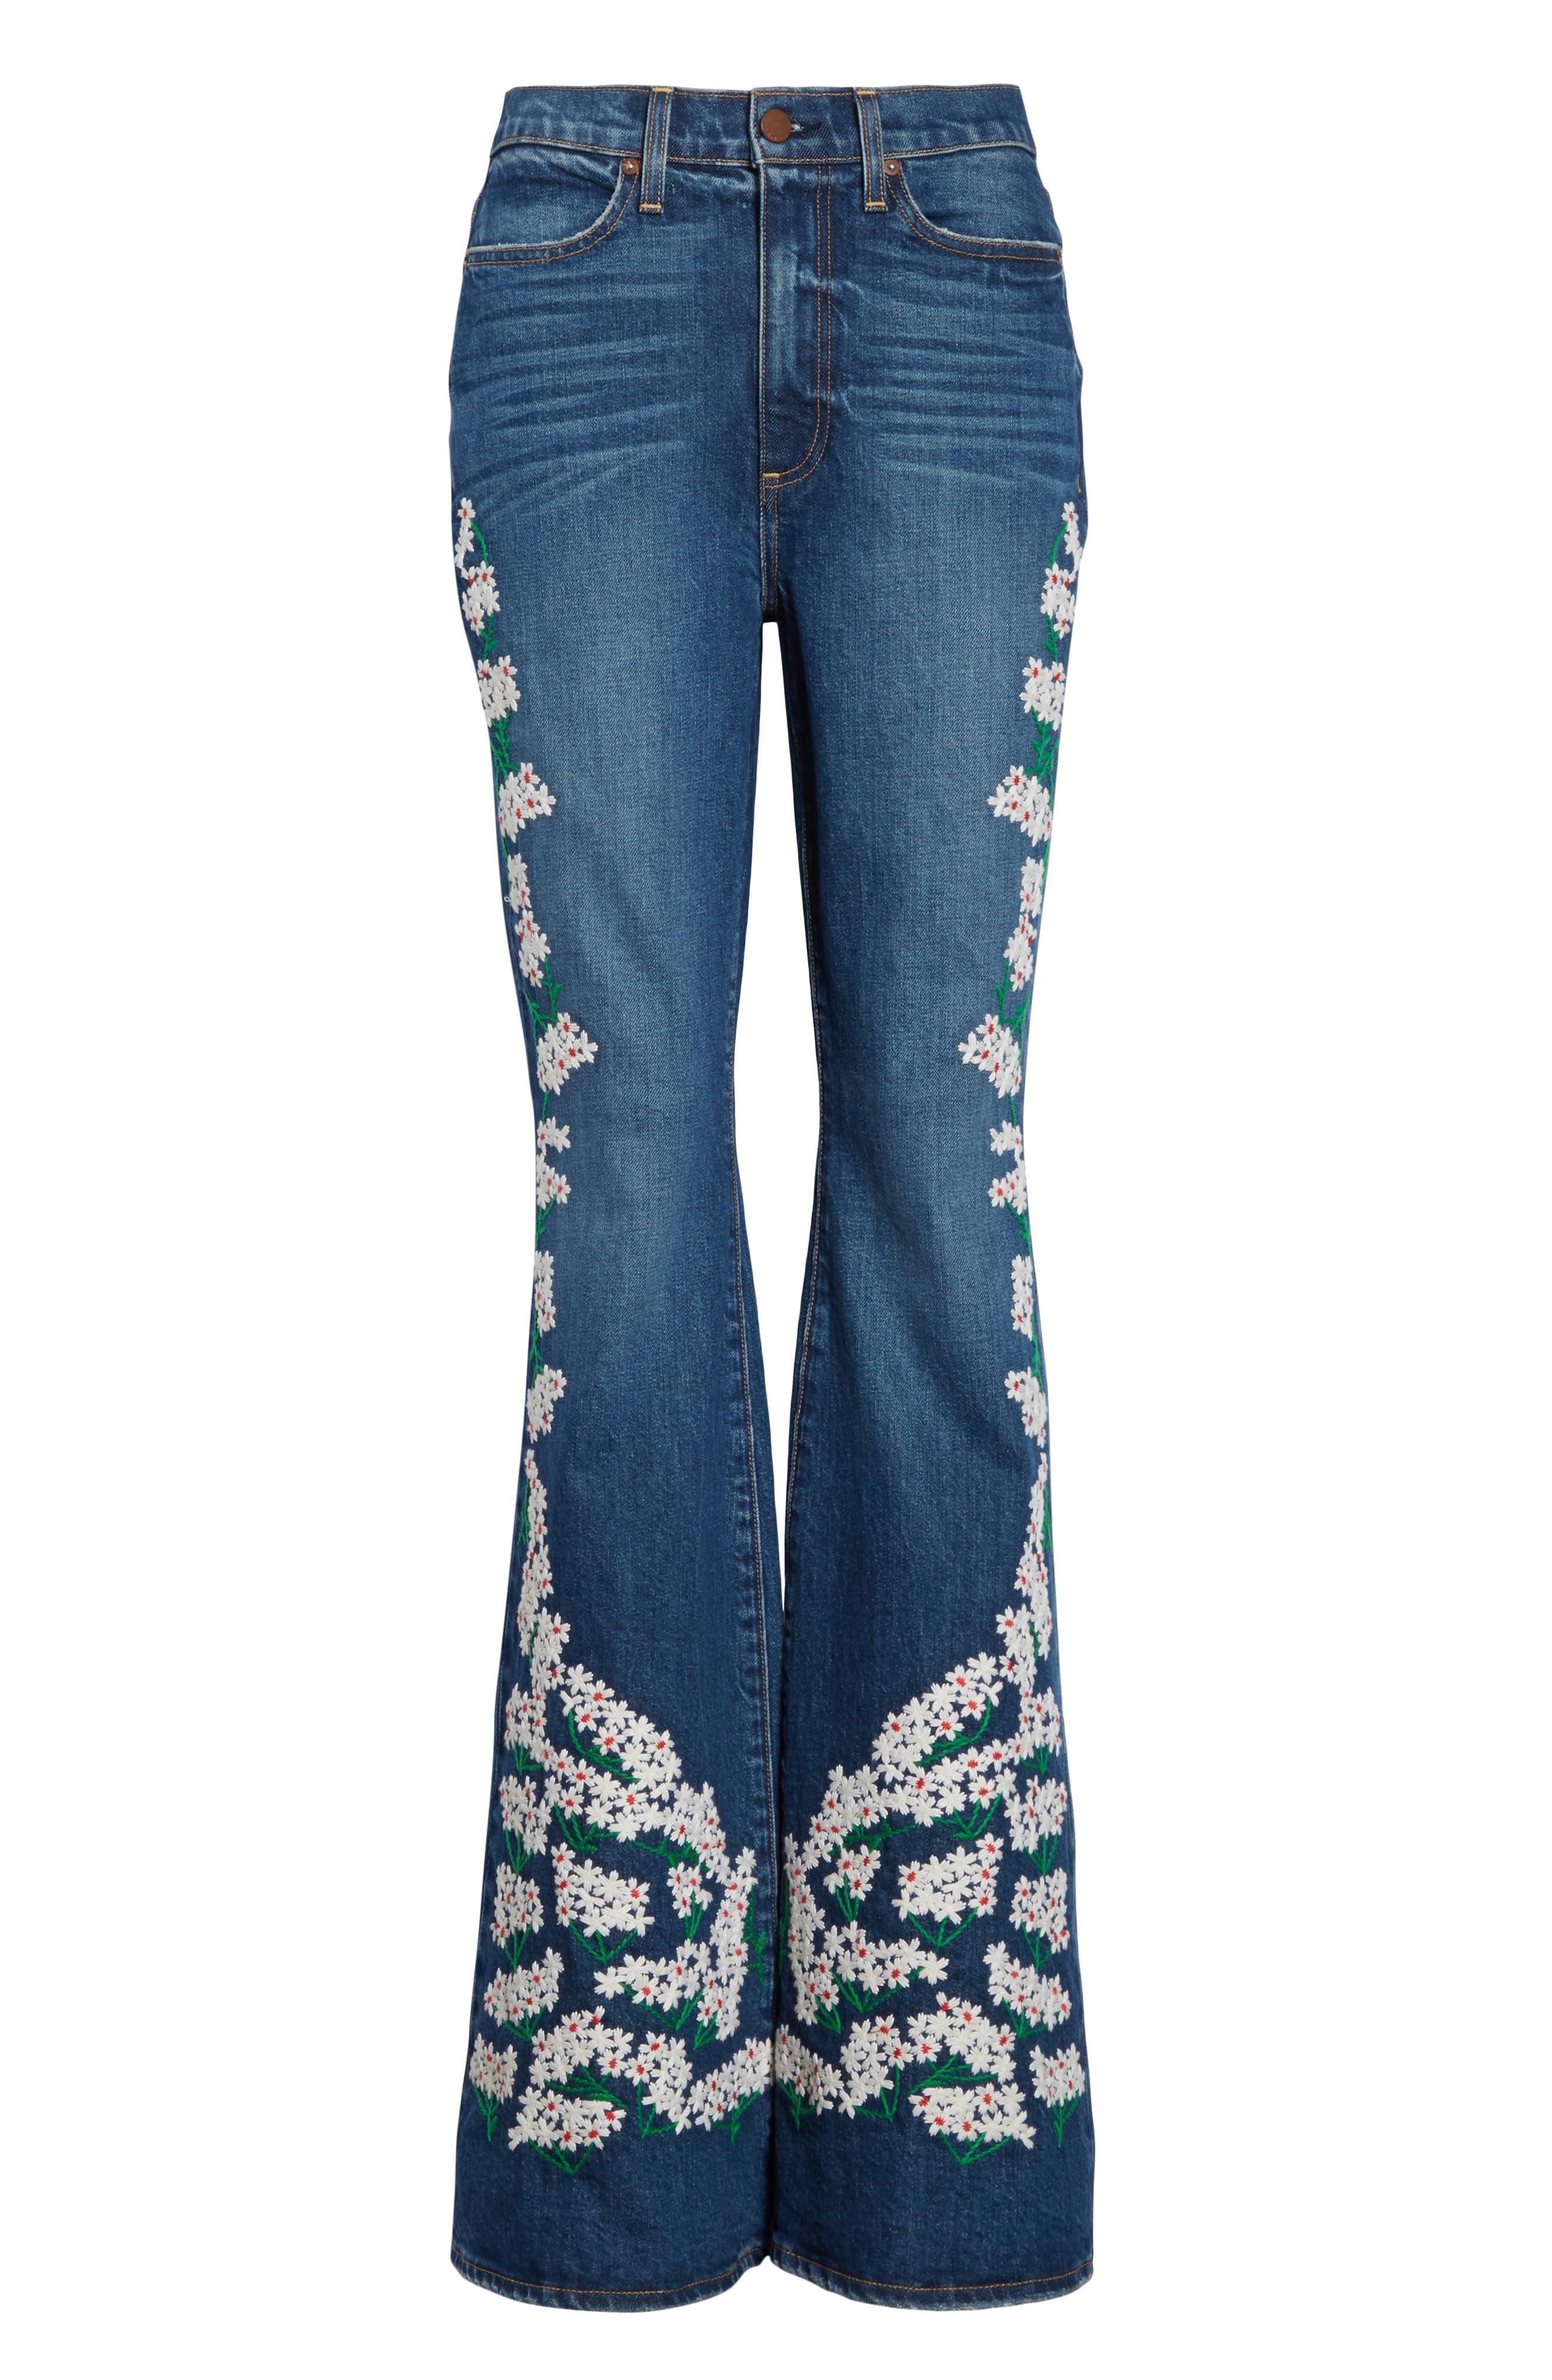 AO.LA Beautiful High Waist Bell Jeans,                             Alternate thumbnail 6, color,                             Secret Meeting